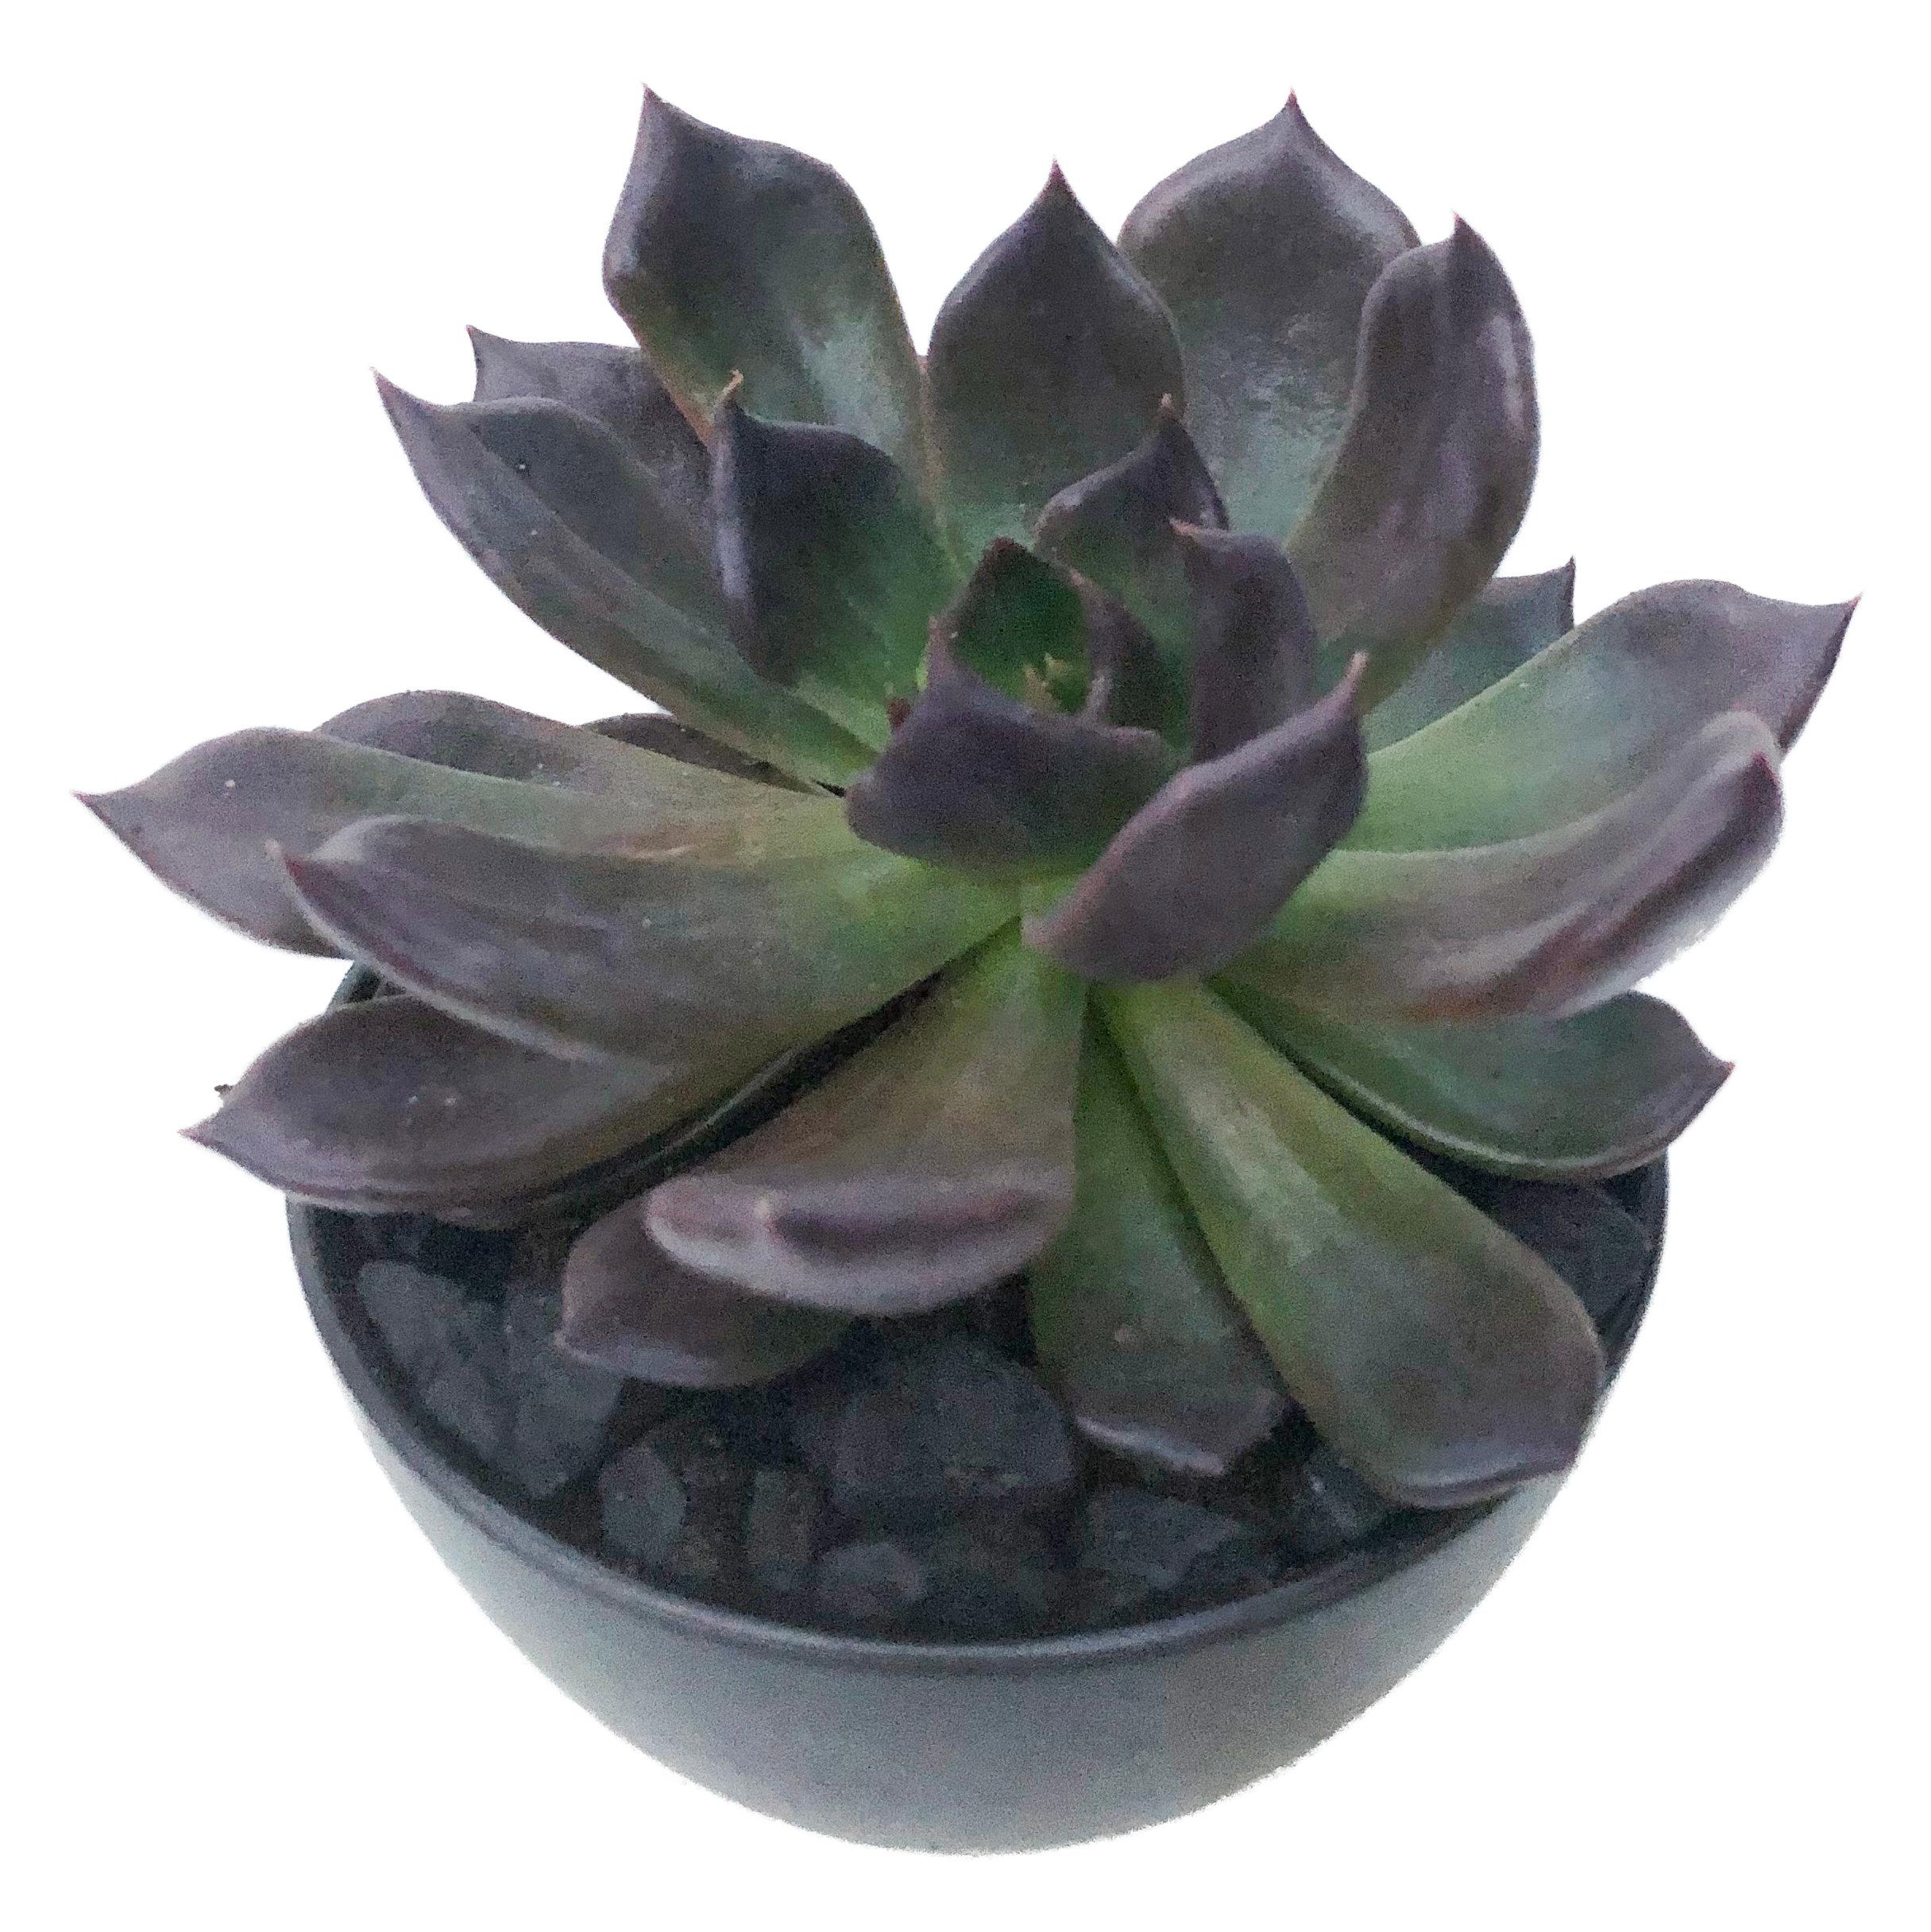 Echeveria Black Prince For Sale Clouds Hill Succulents